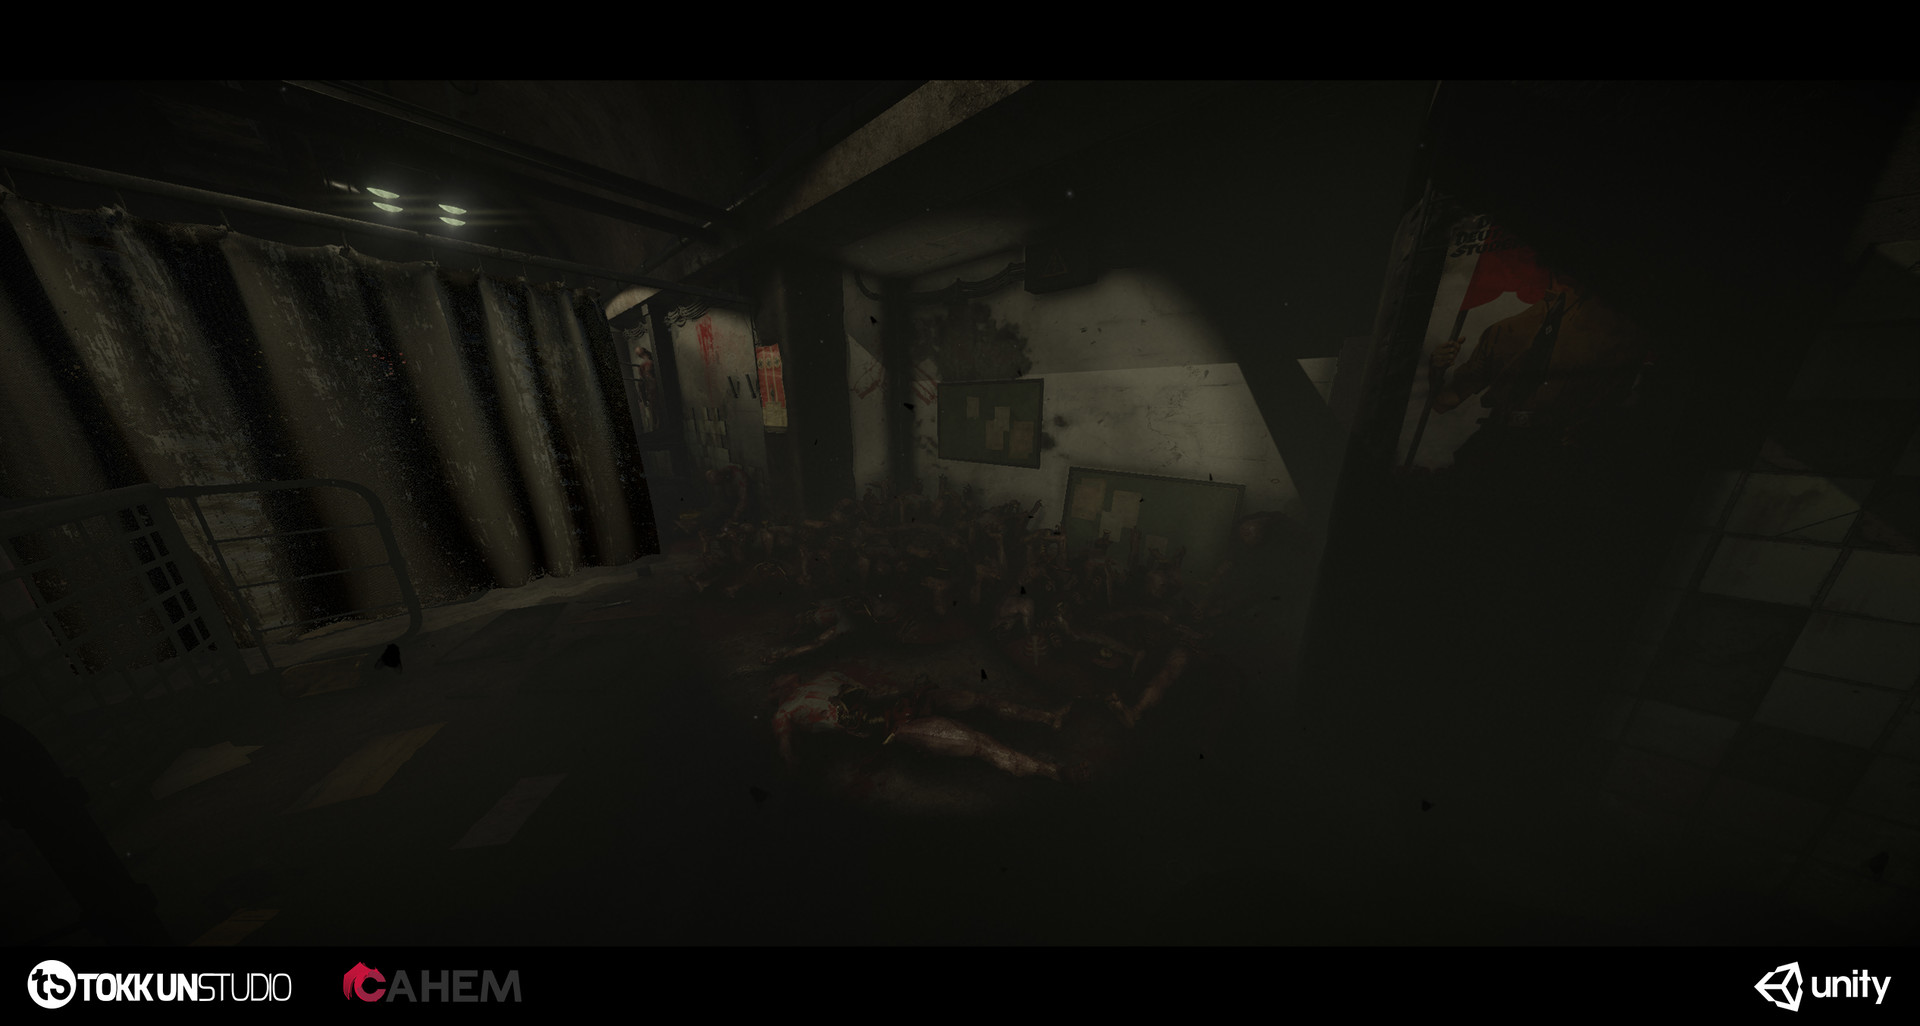 Tokkun studio bunker shot 02